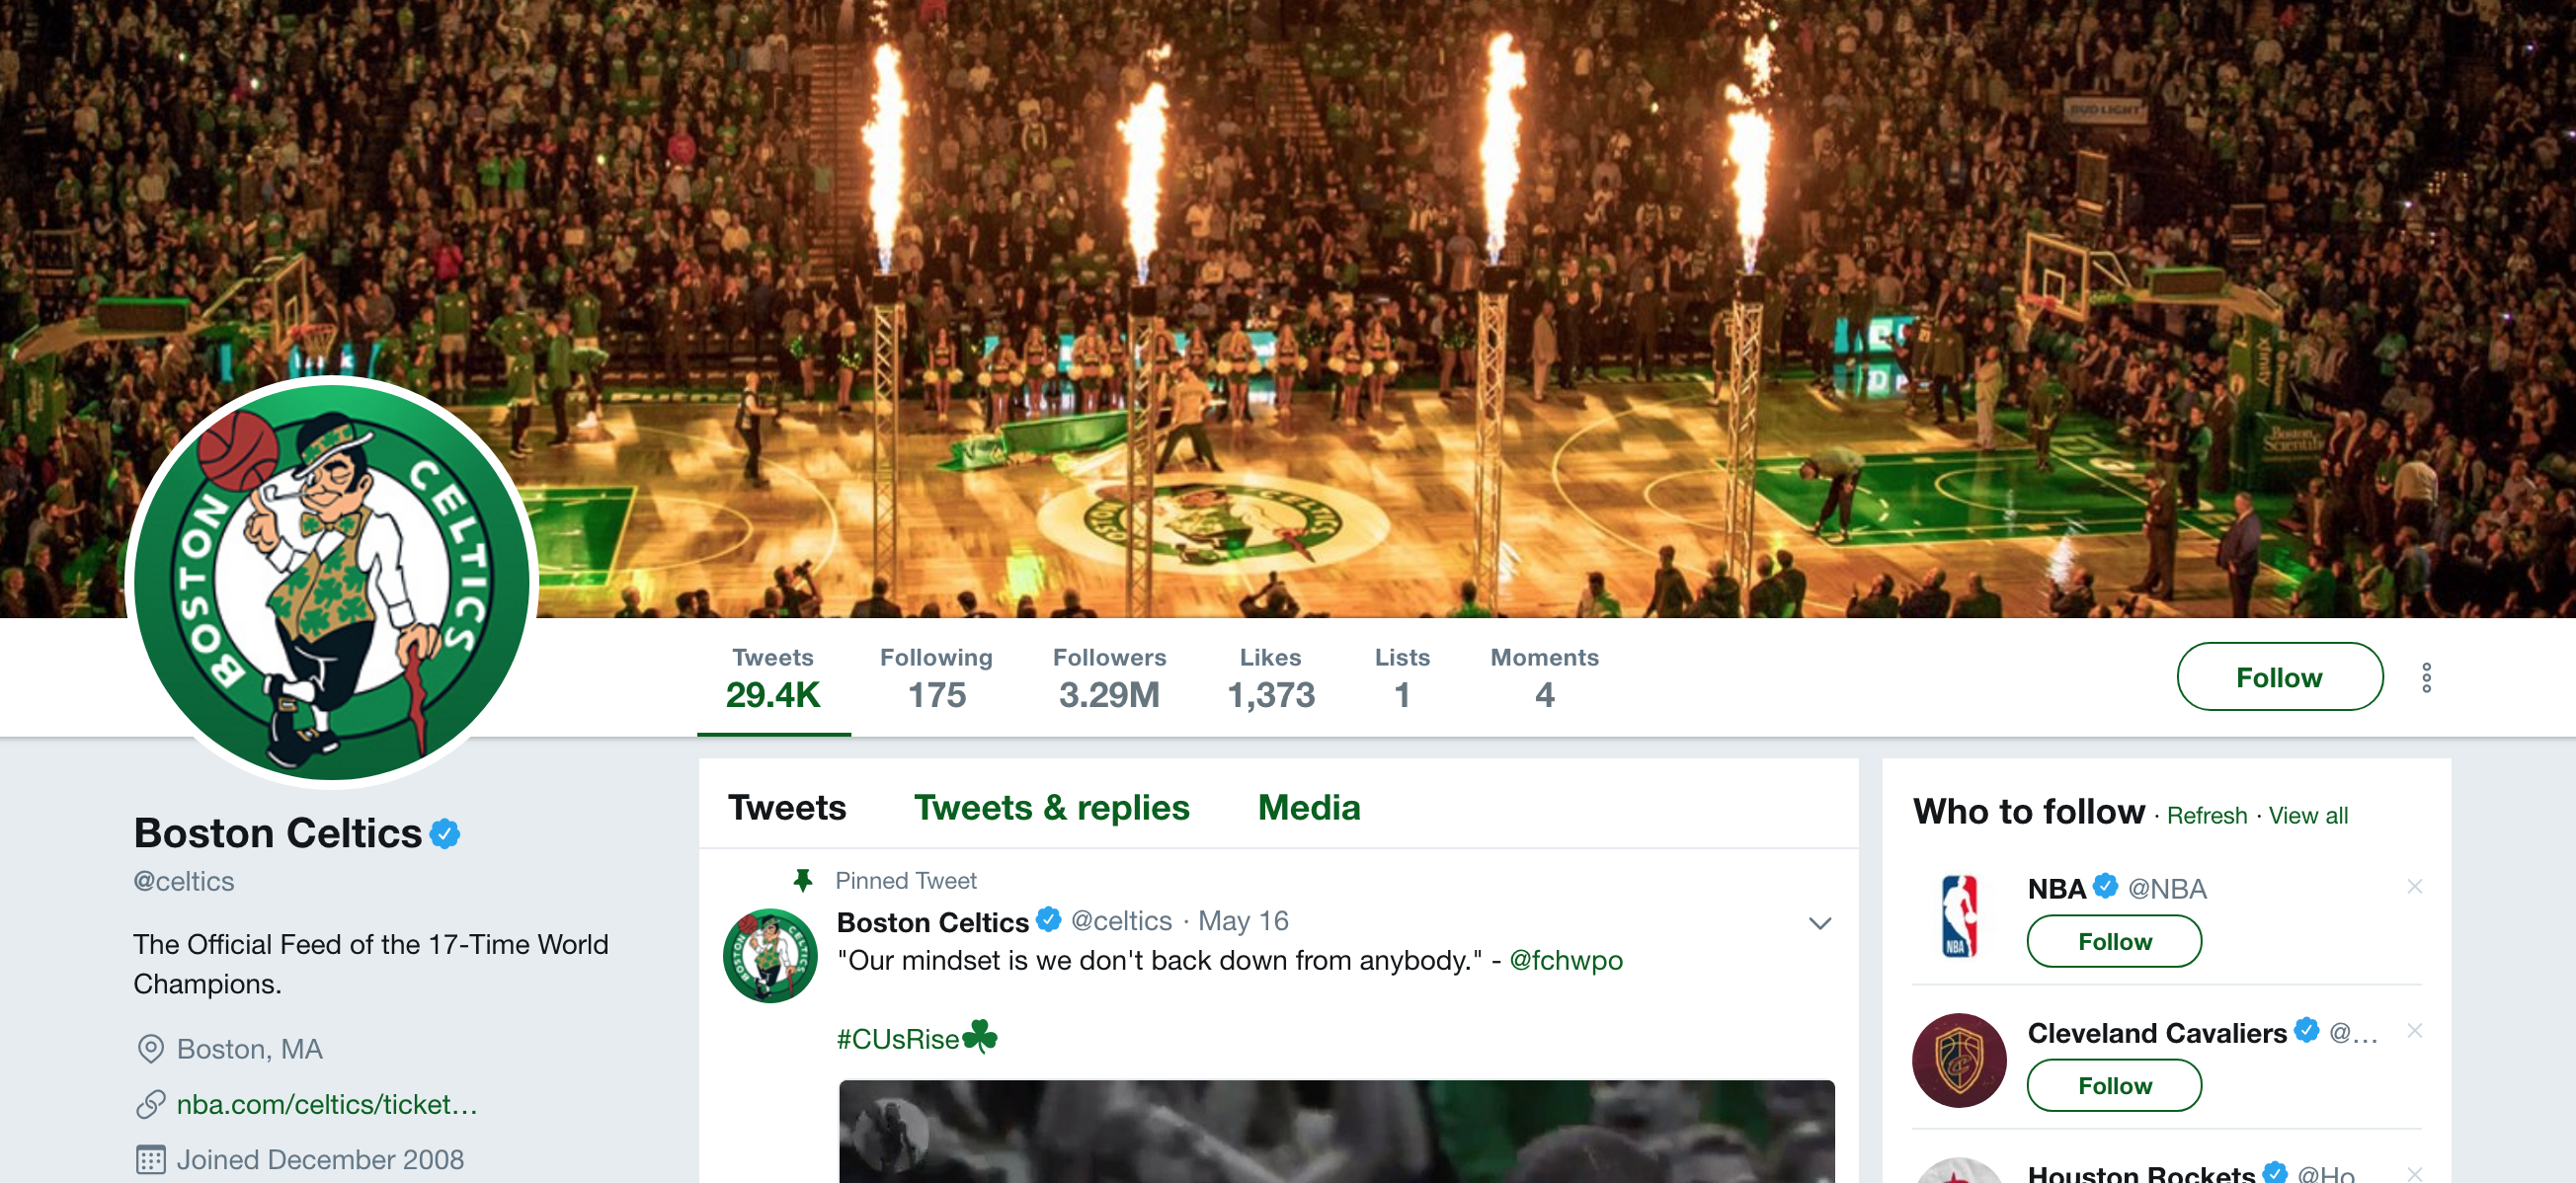 Boston Celtics Twitter